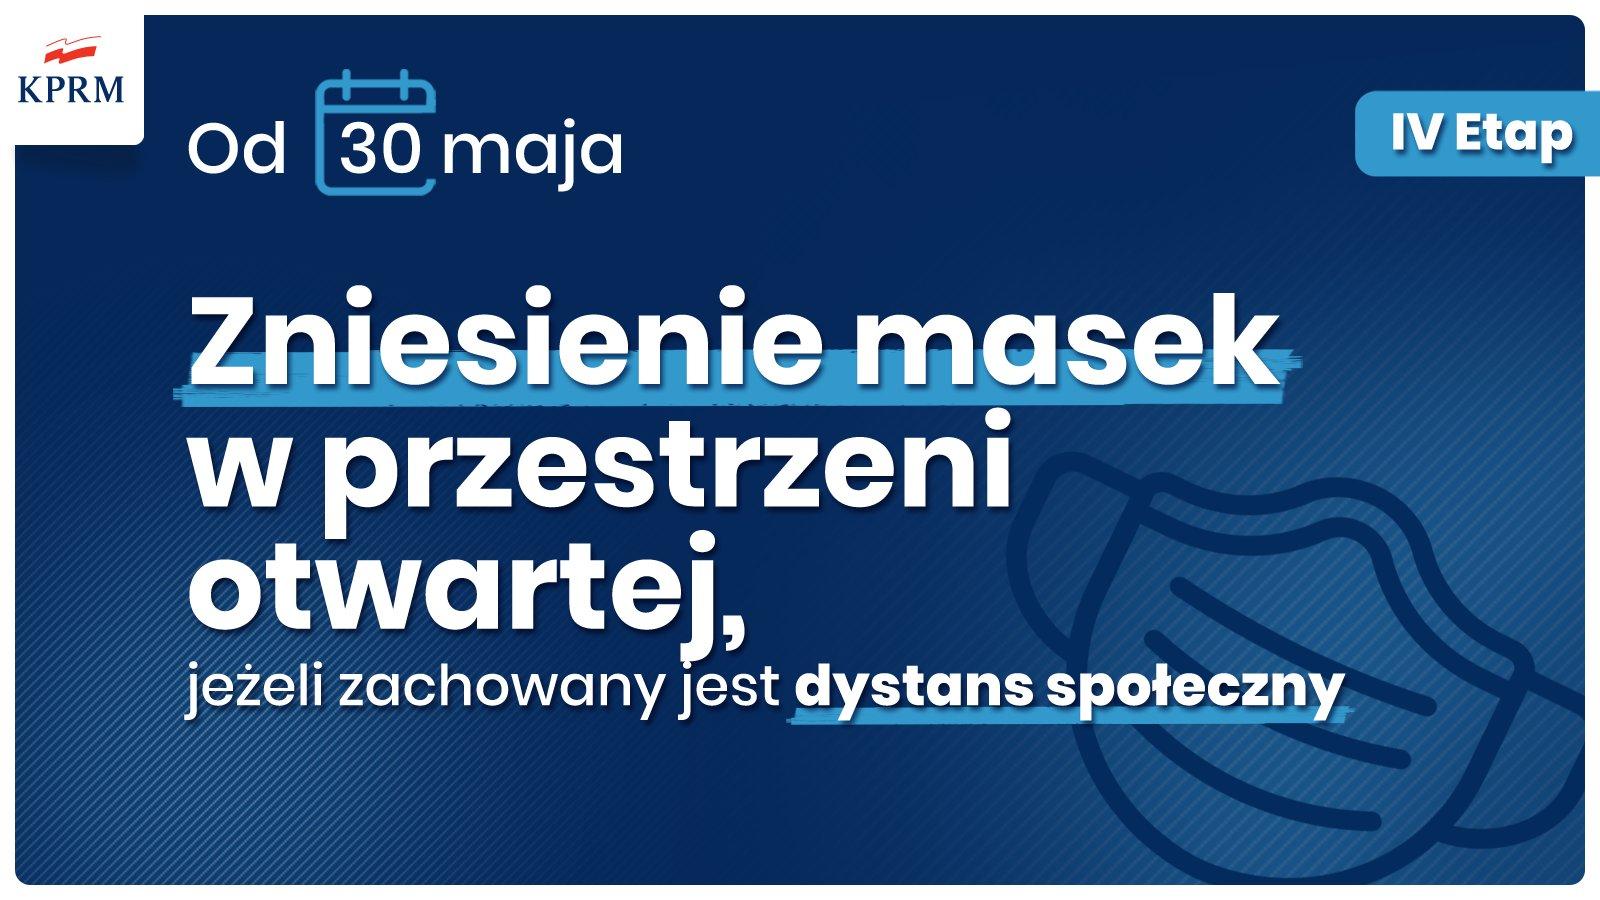 http://m.82-200.pl/2020/05/orig/covid01-6006.jpg